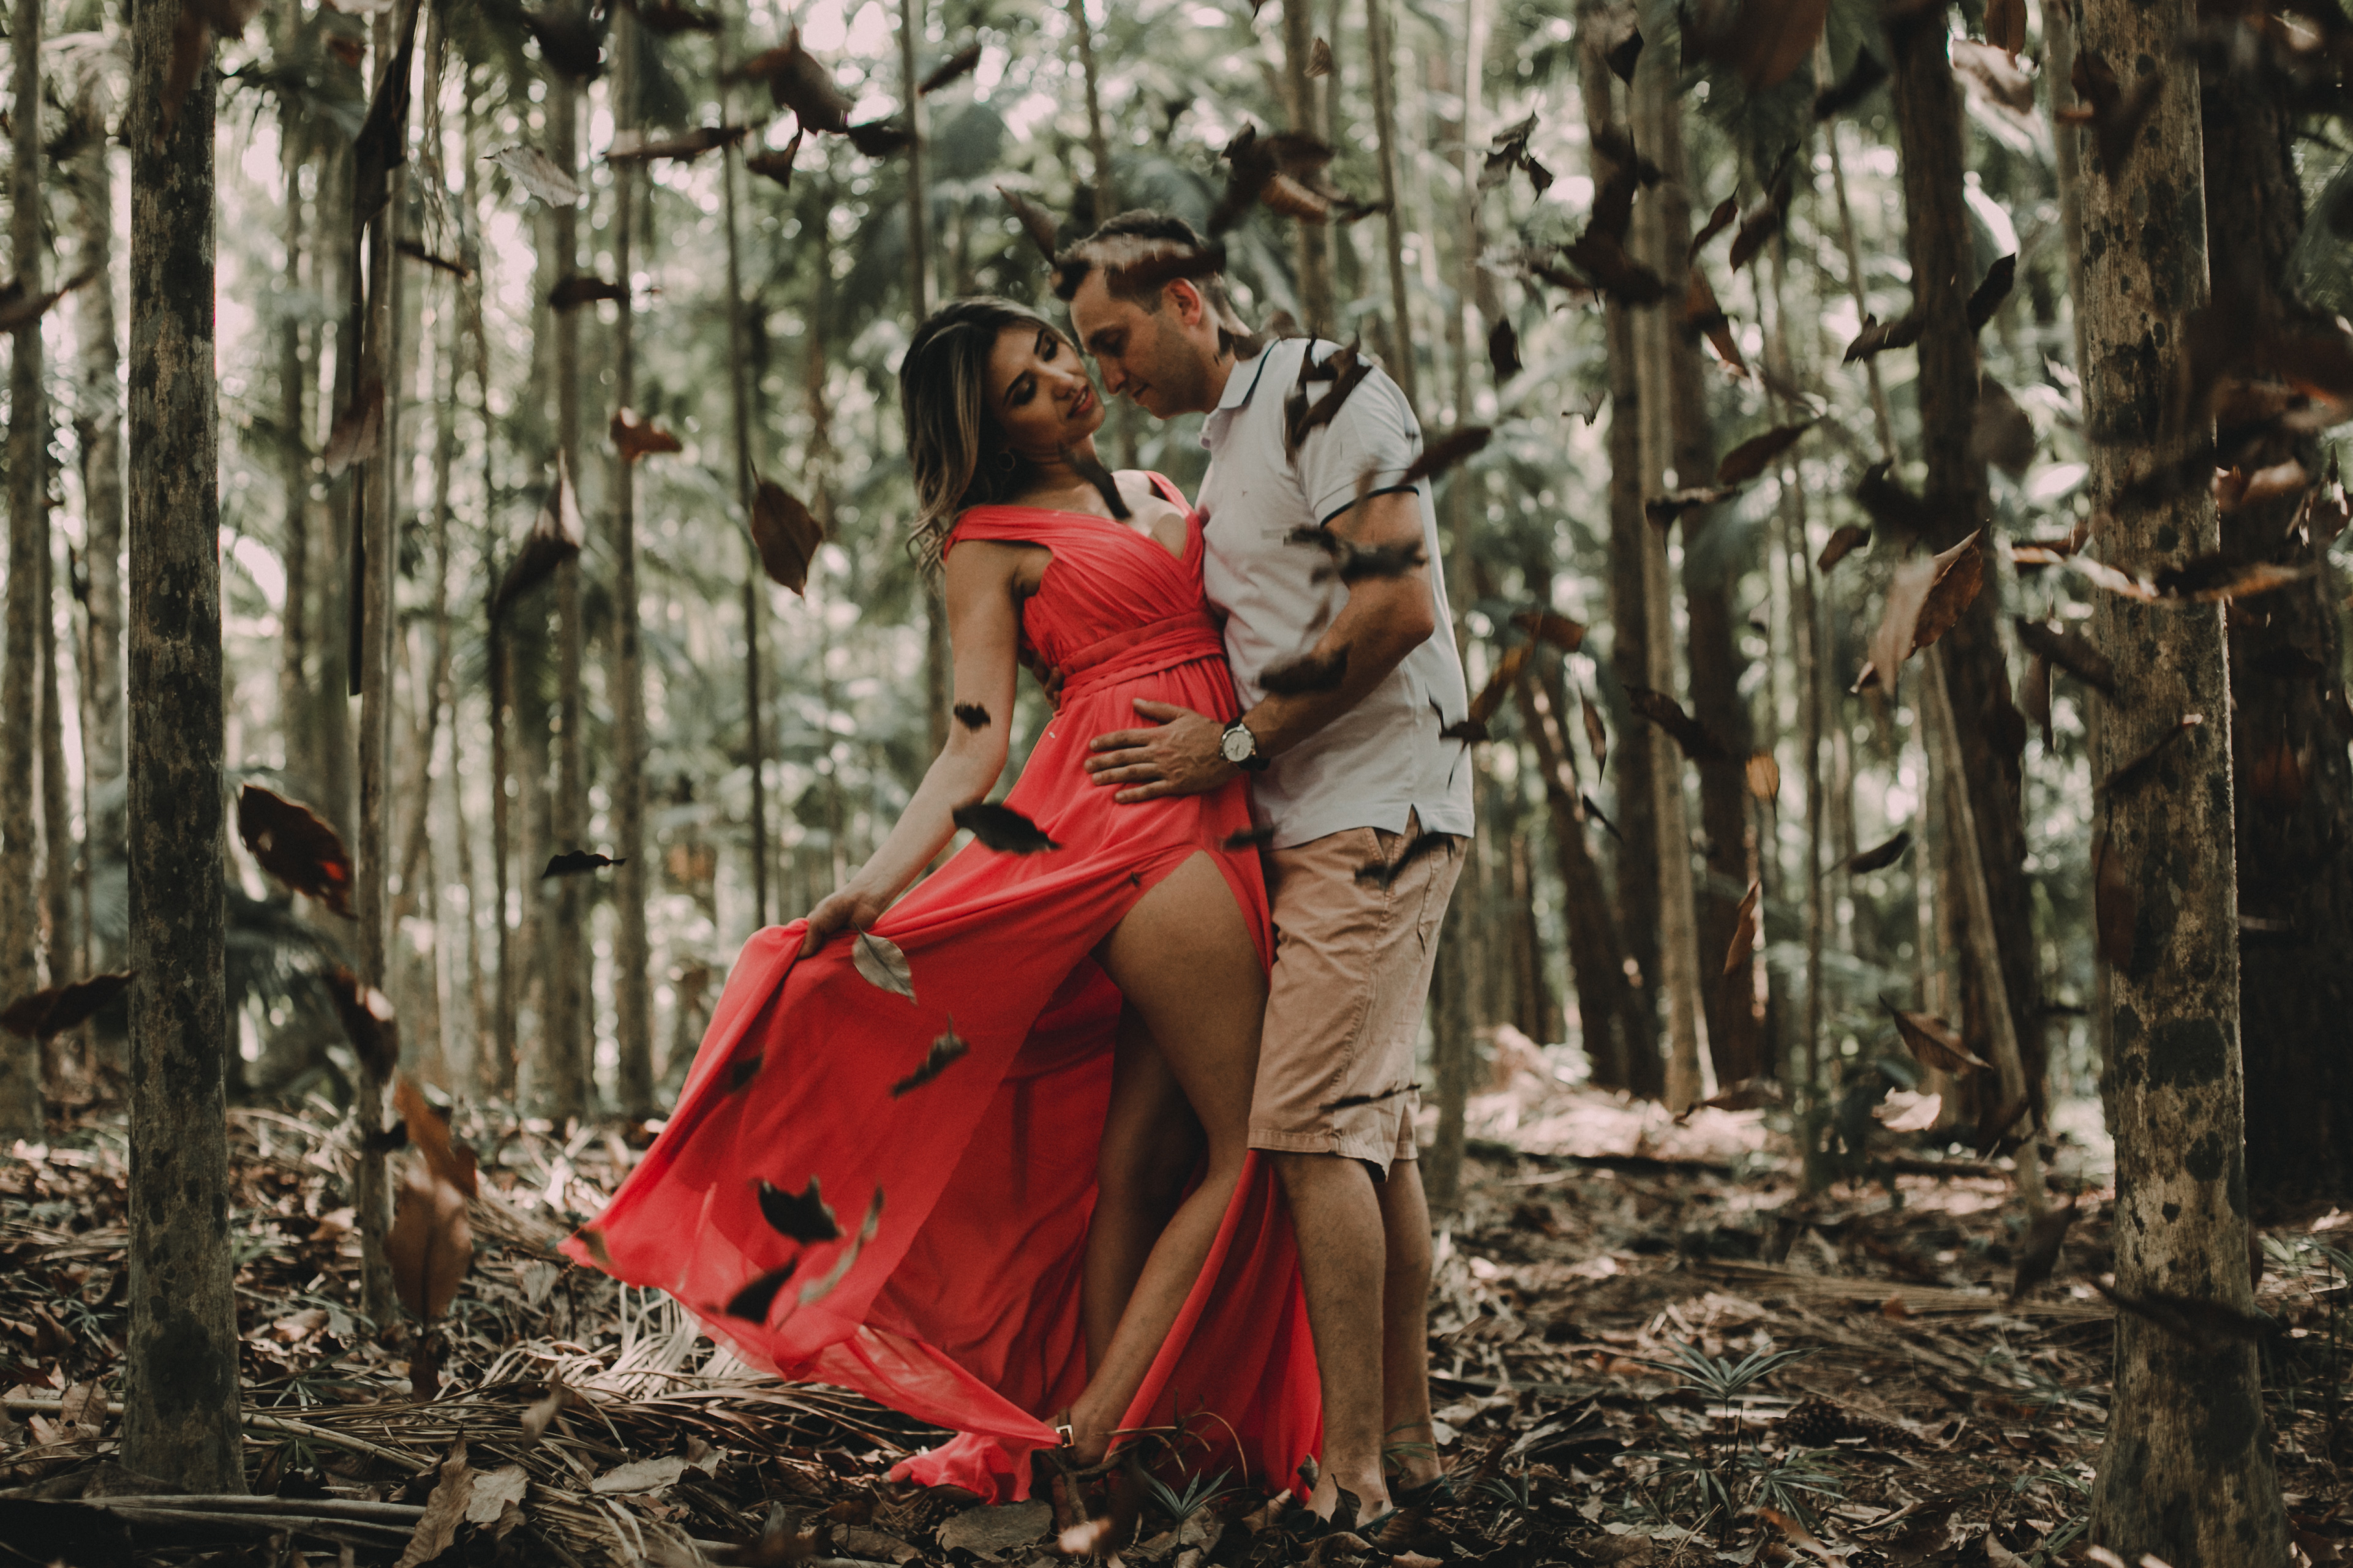 Contate Johnny Roedel - Fotógrafo de casamentos, ensaios e eventos - Santa Catarina